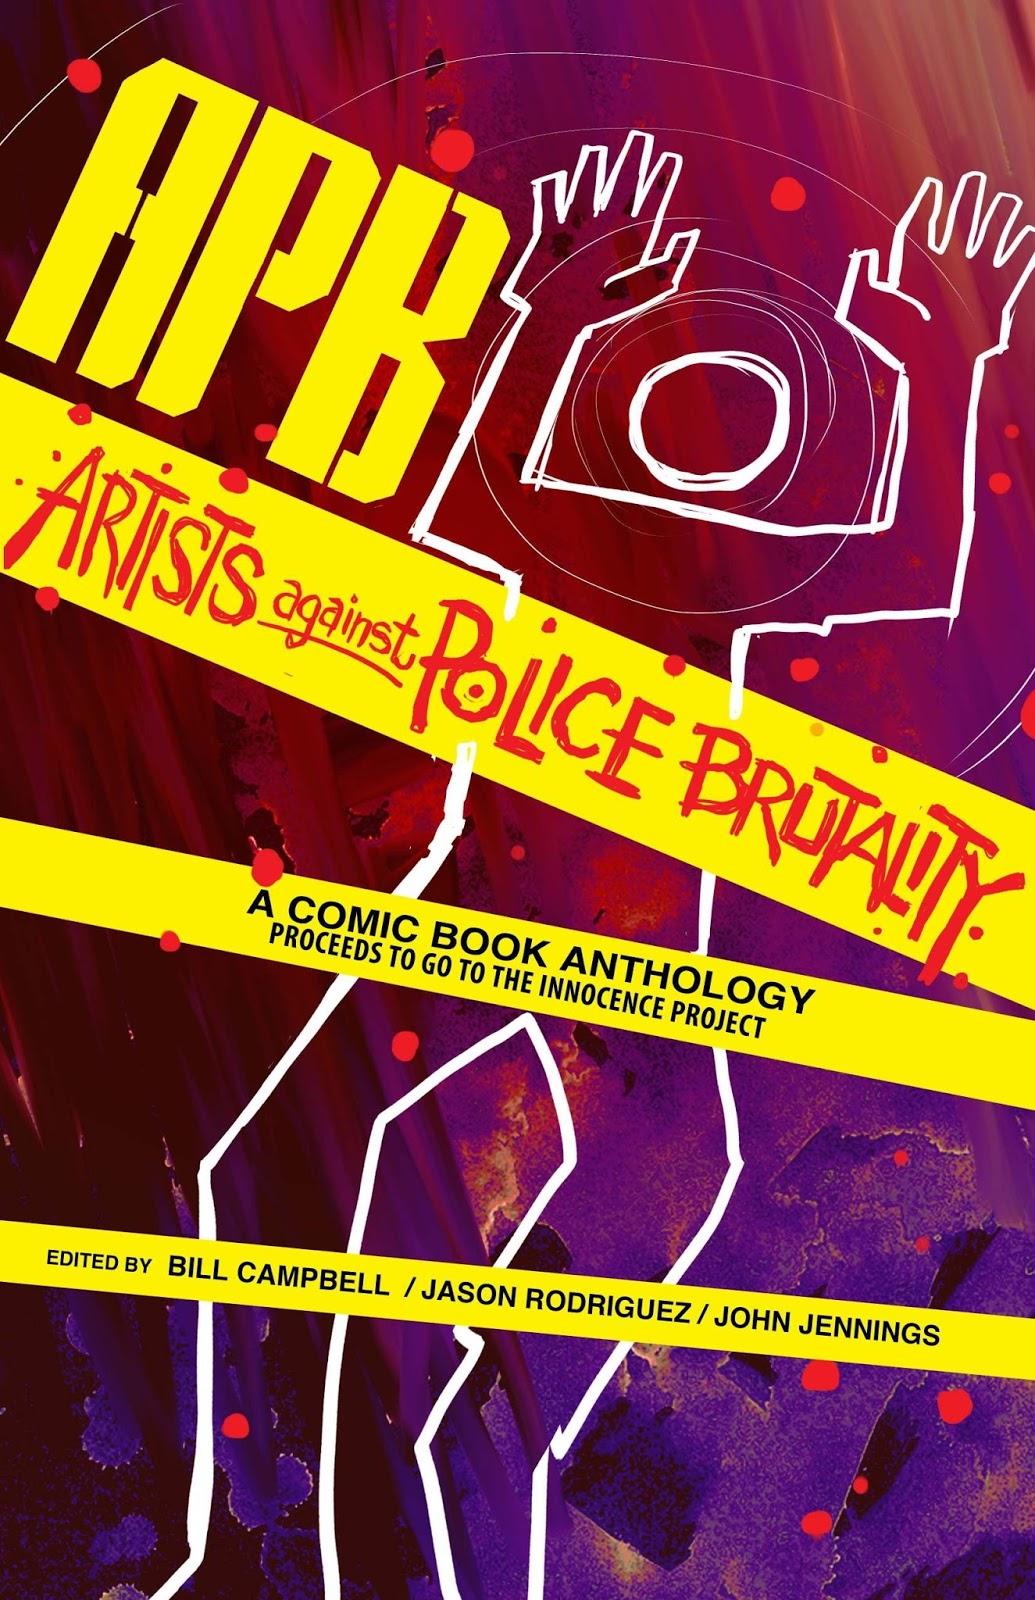 artist against police brutality blerds online artist against police brutality